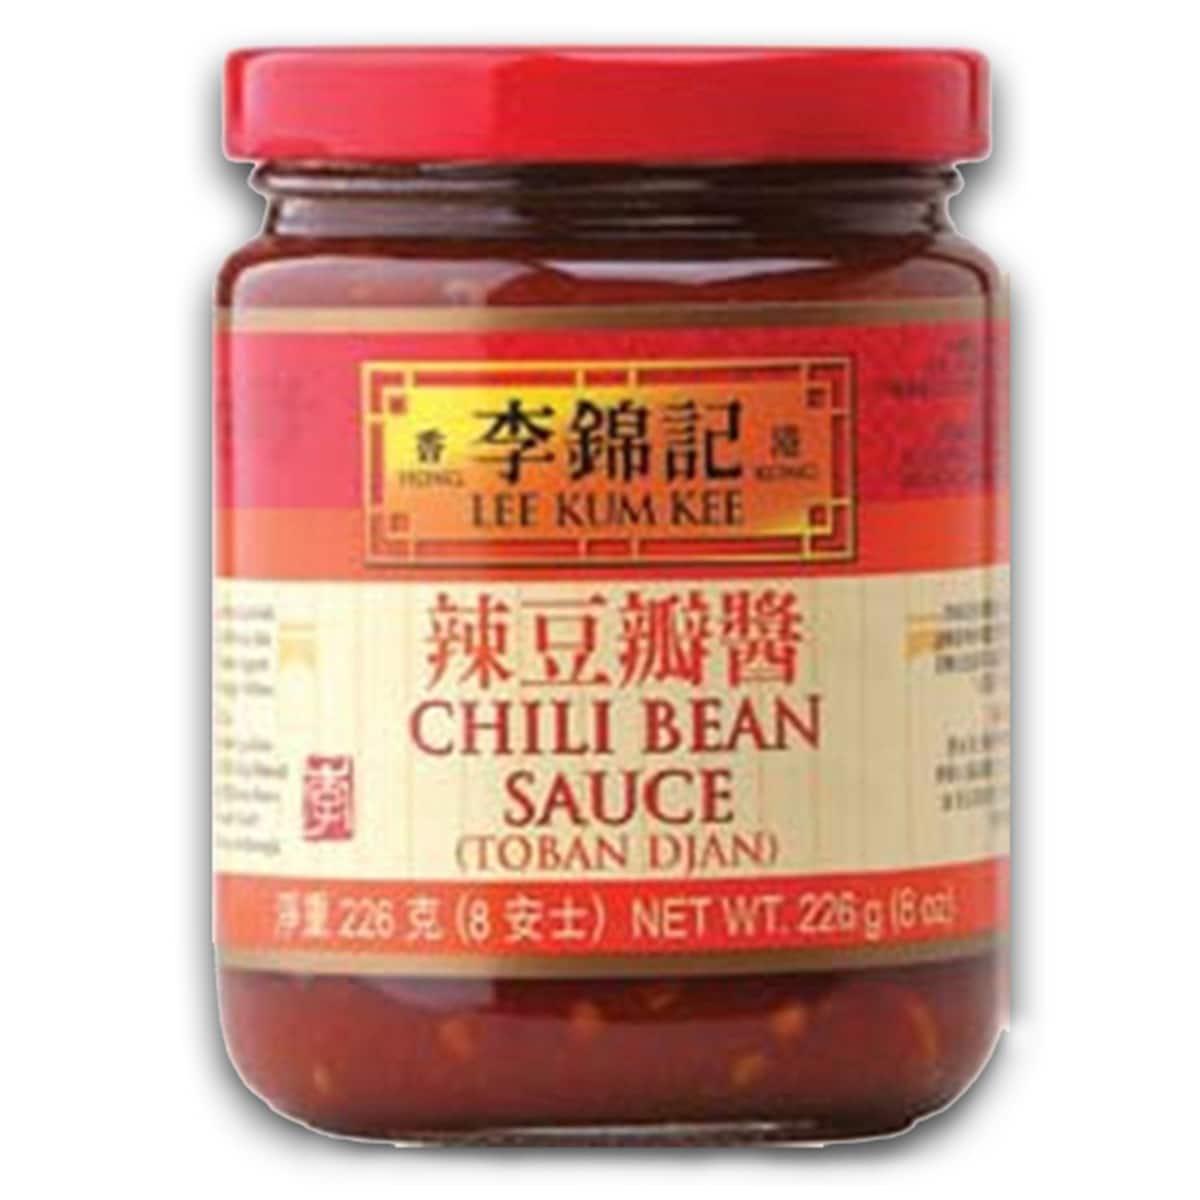 Buy Lee Kum Kee Chili Bean Sauce (Toban Djan) - 226 gm